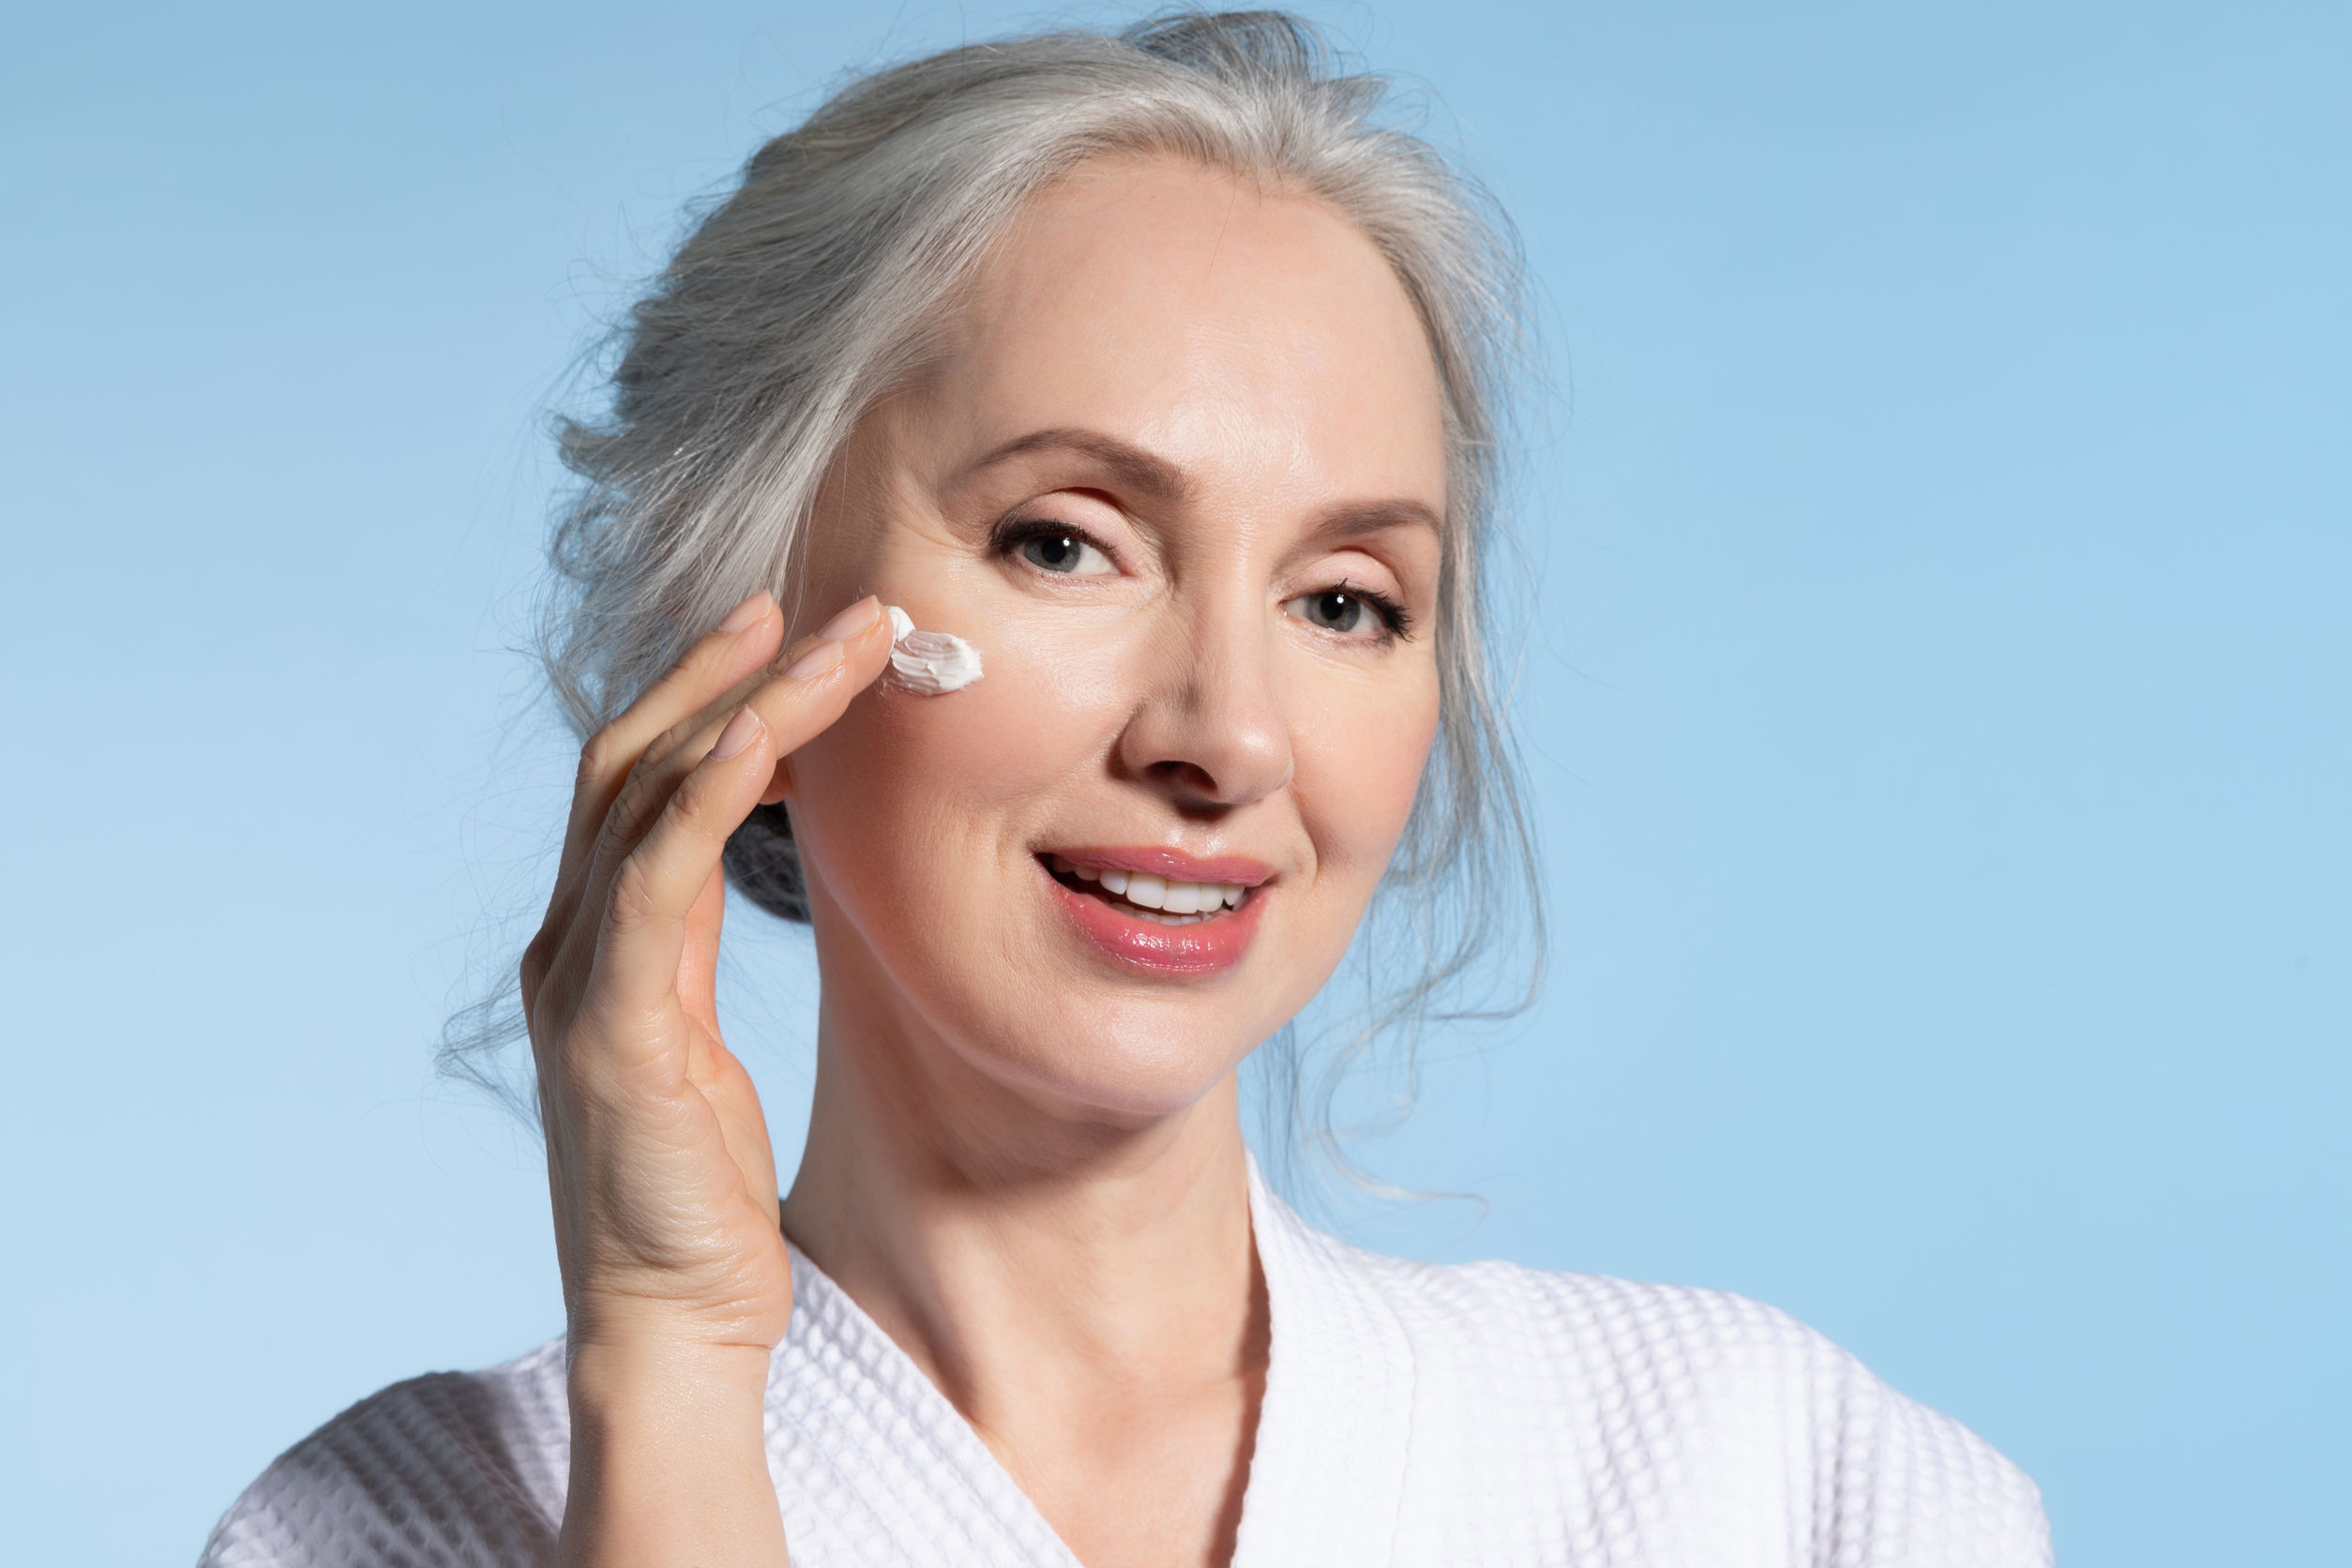 Anti Aging Gesichtscreme: Test, Wirkung, Anwendung & Studien (04/21)